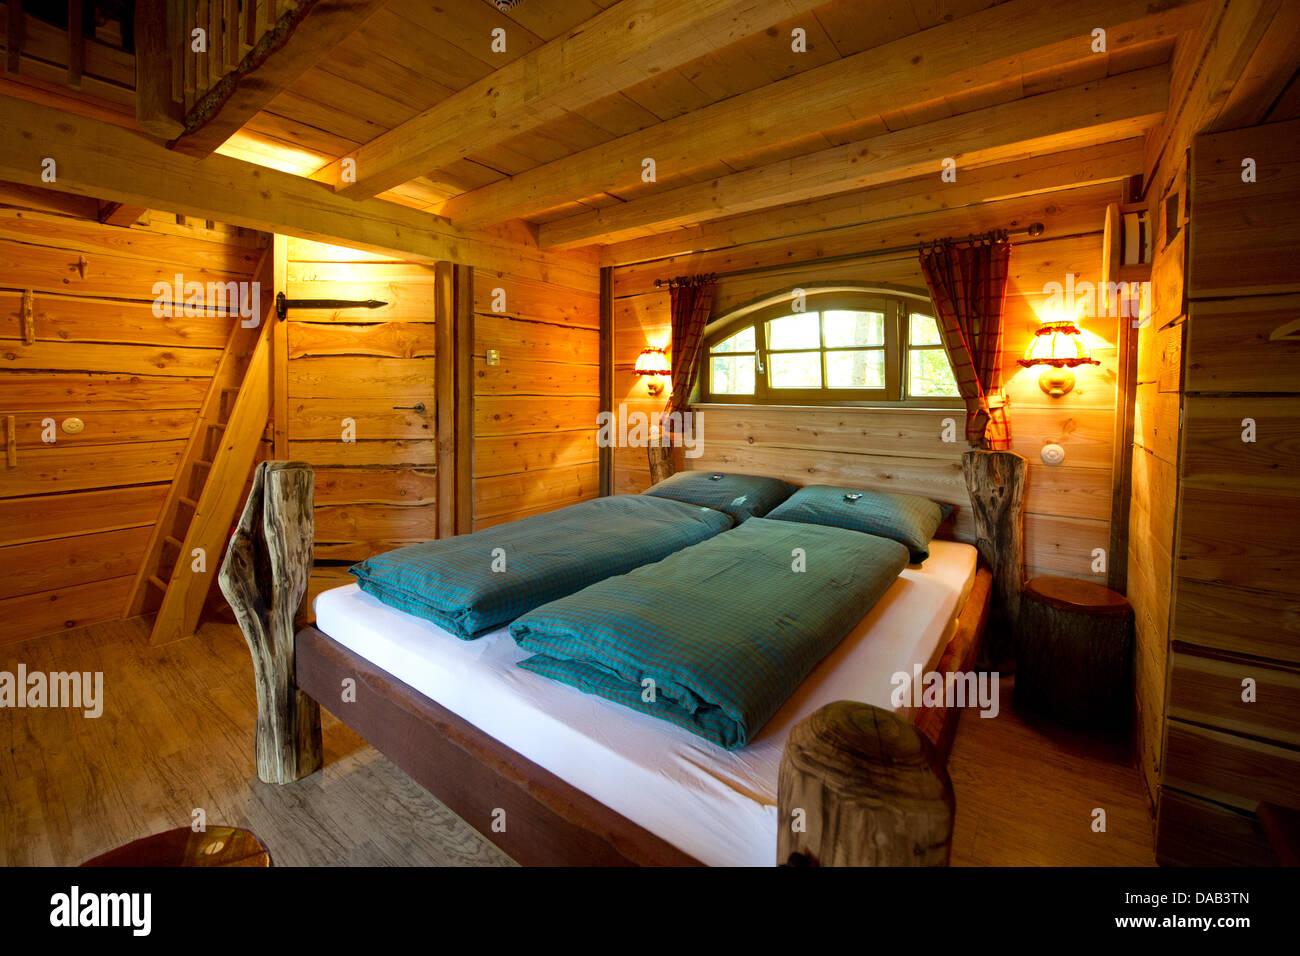 tripsdrill stockfotos tripsdrill bilder alamy. Black Bedroom Furniture Sets. Home Design Ideas